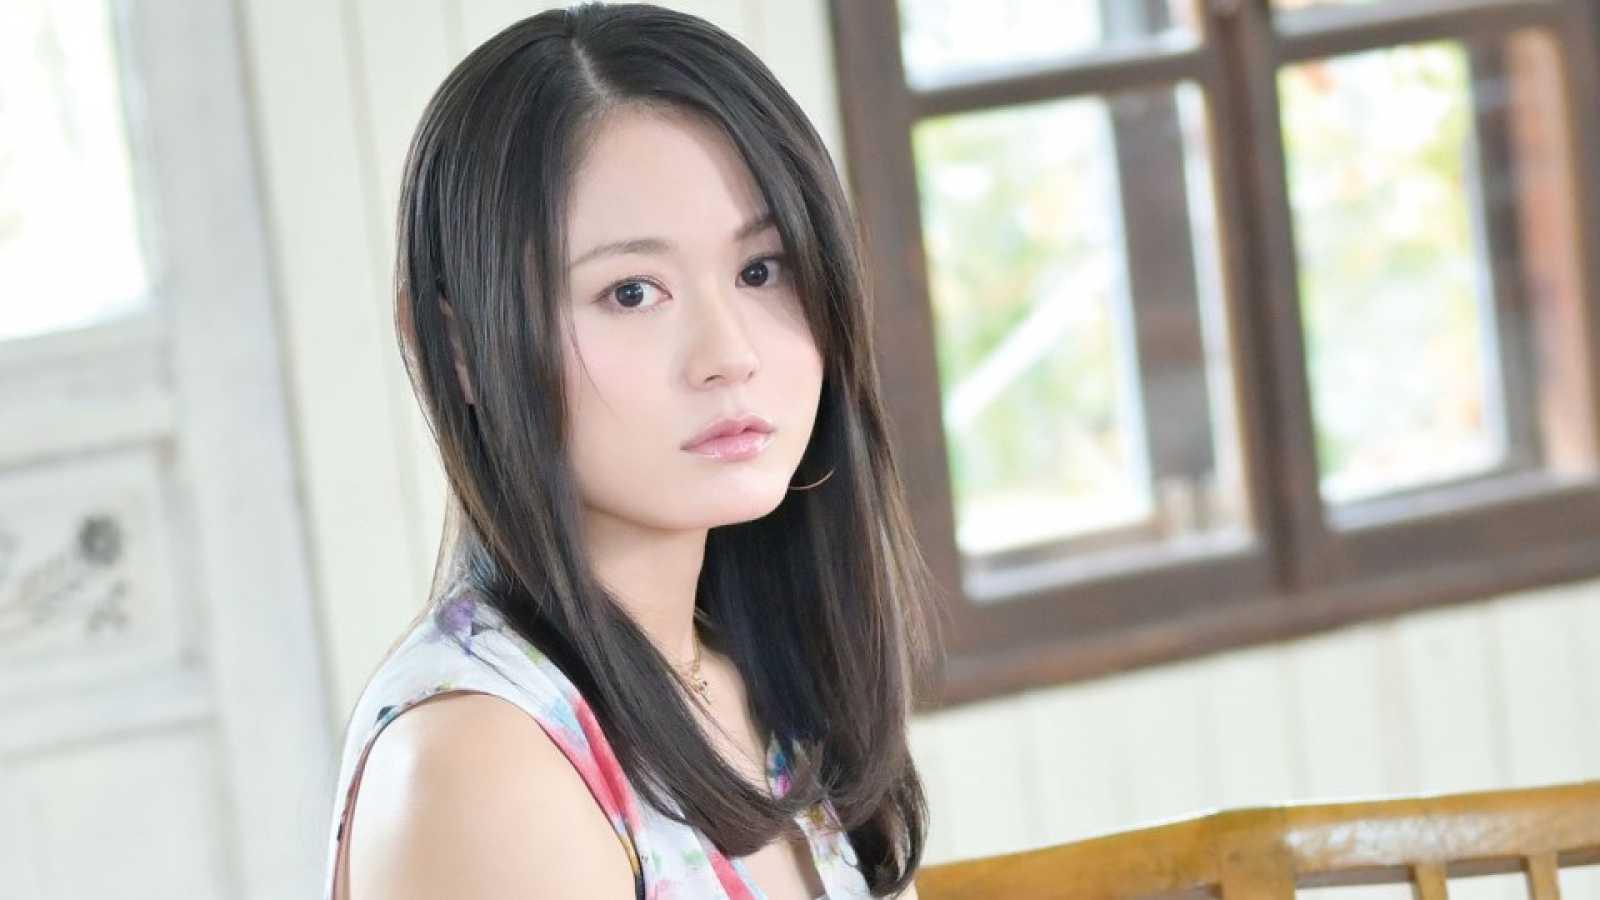 Новый альбом Kaori Oda © TEAM Entertainment Inc. All rights reserved.